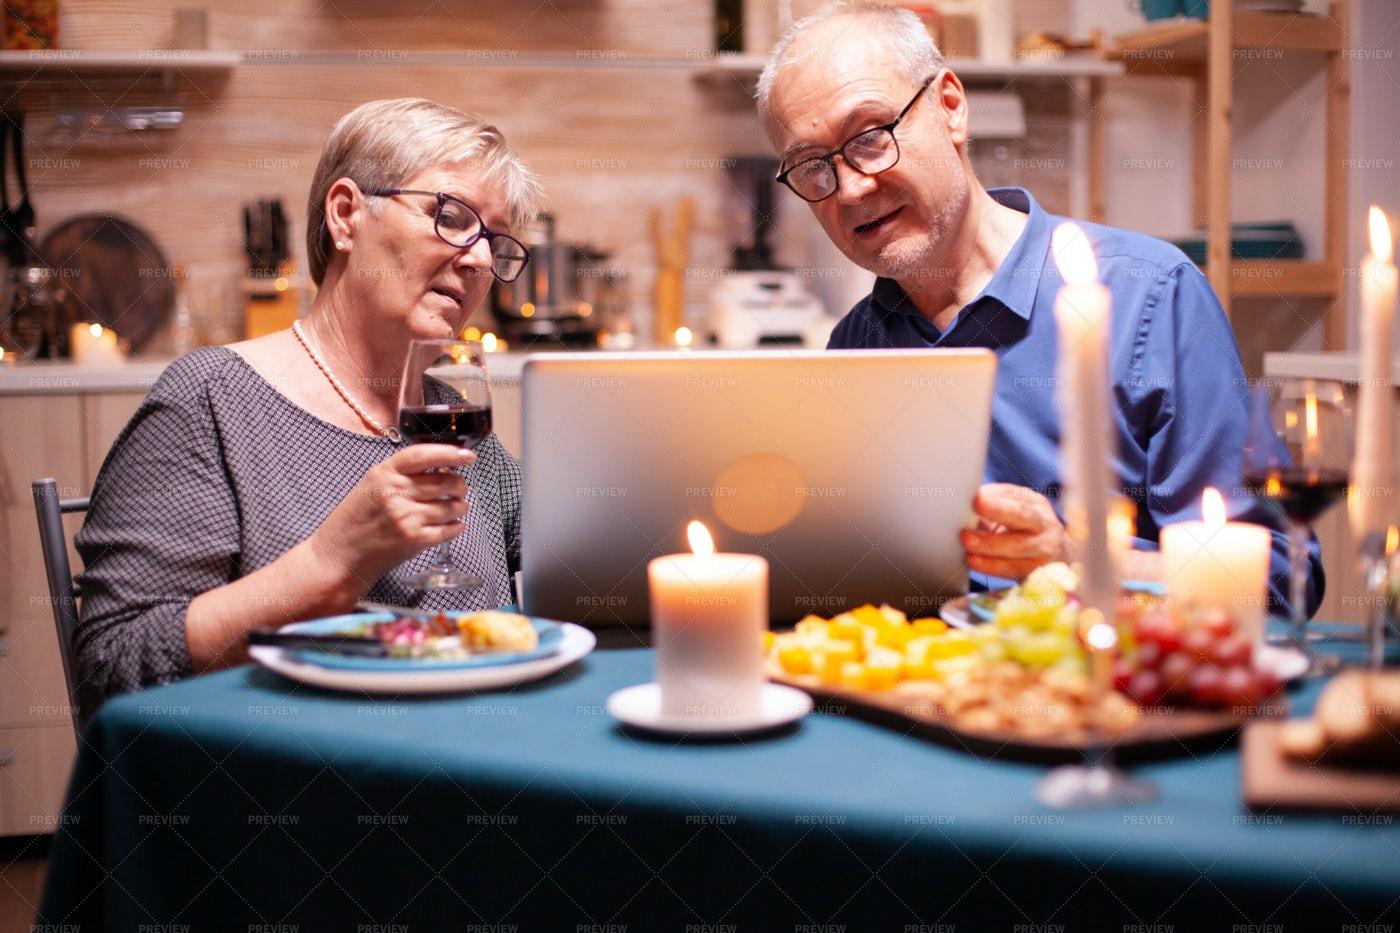 Online Shopping At Dinner: Stock Photos